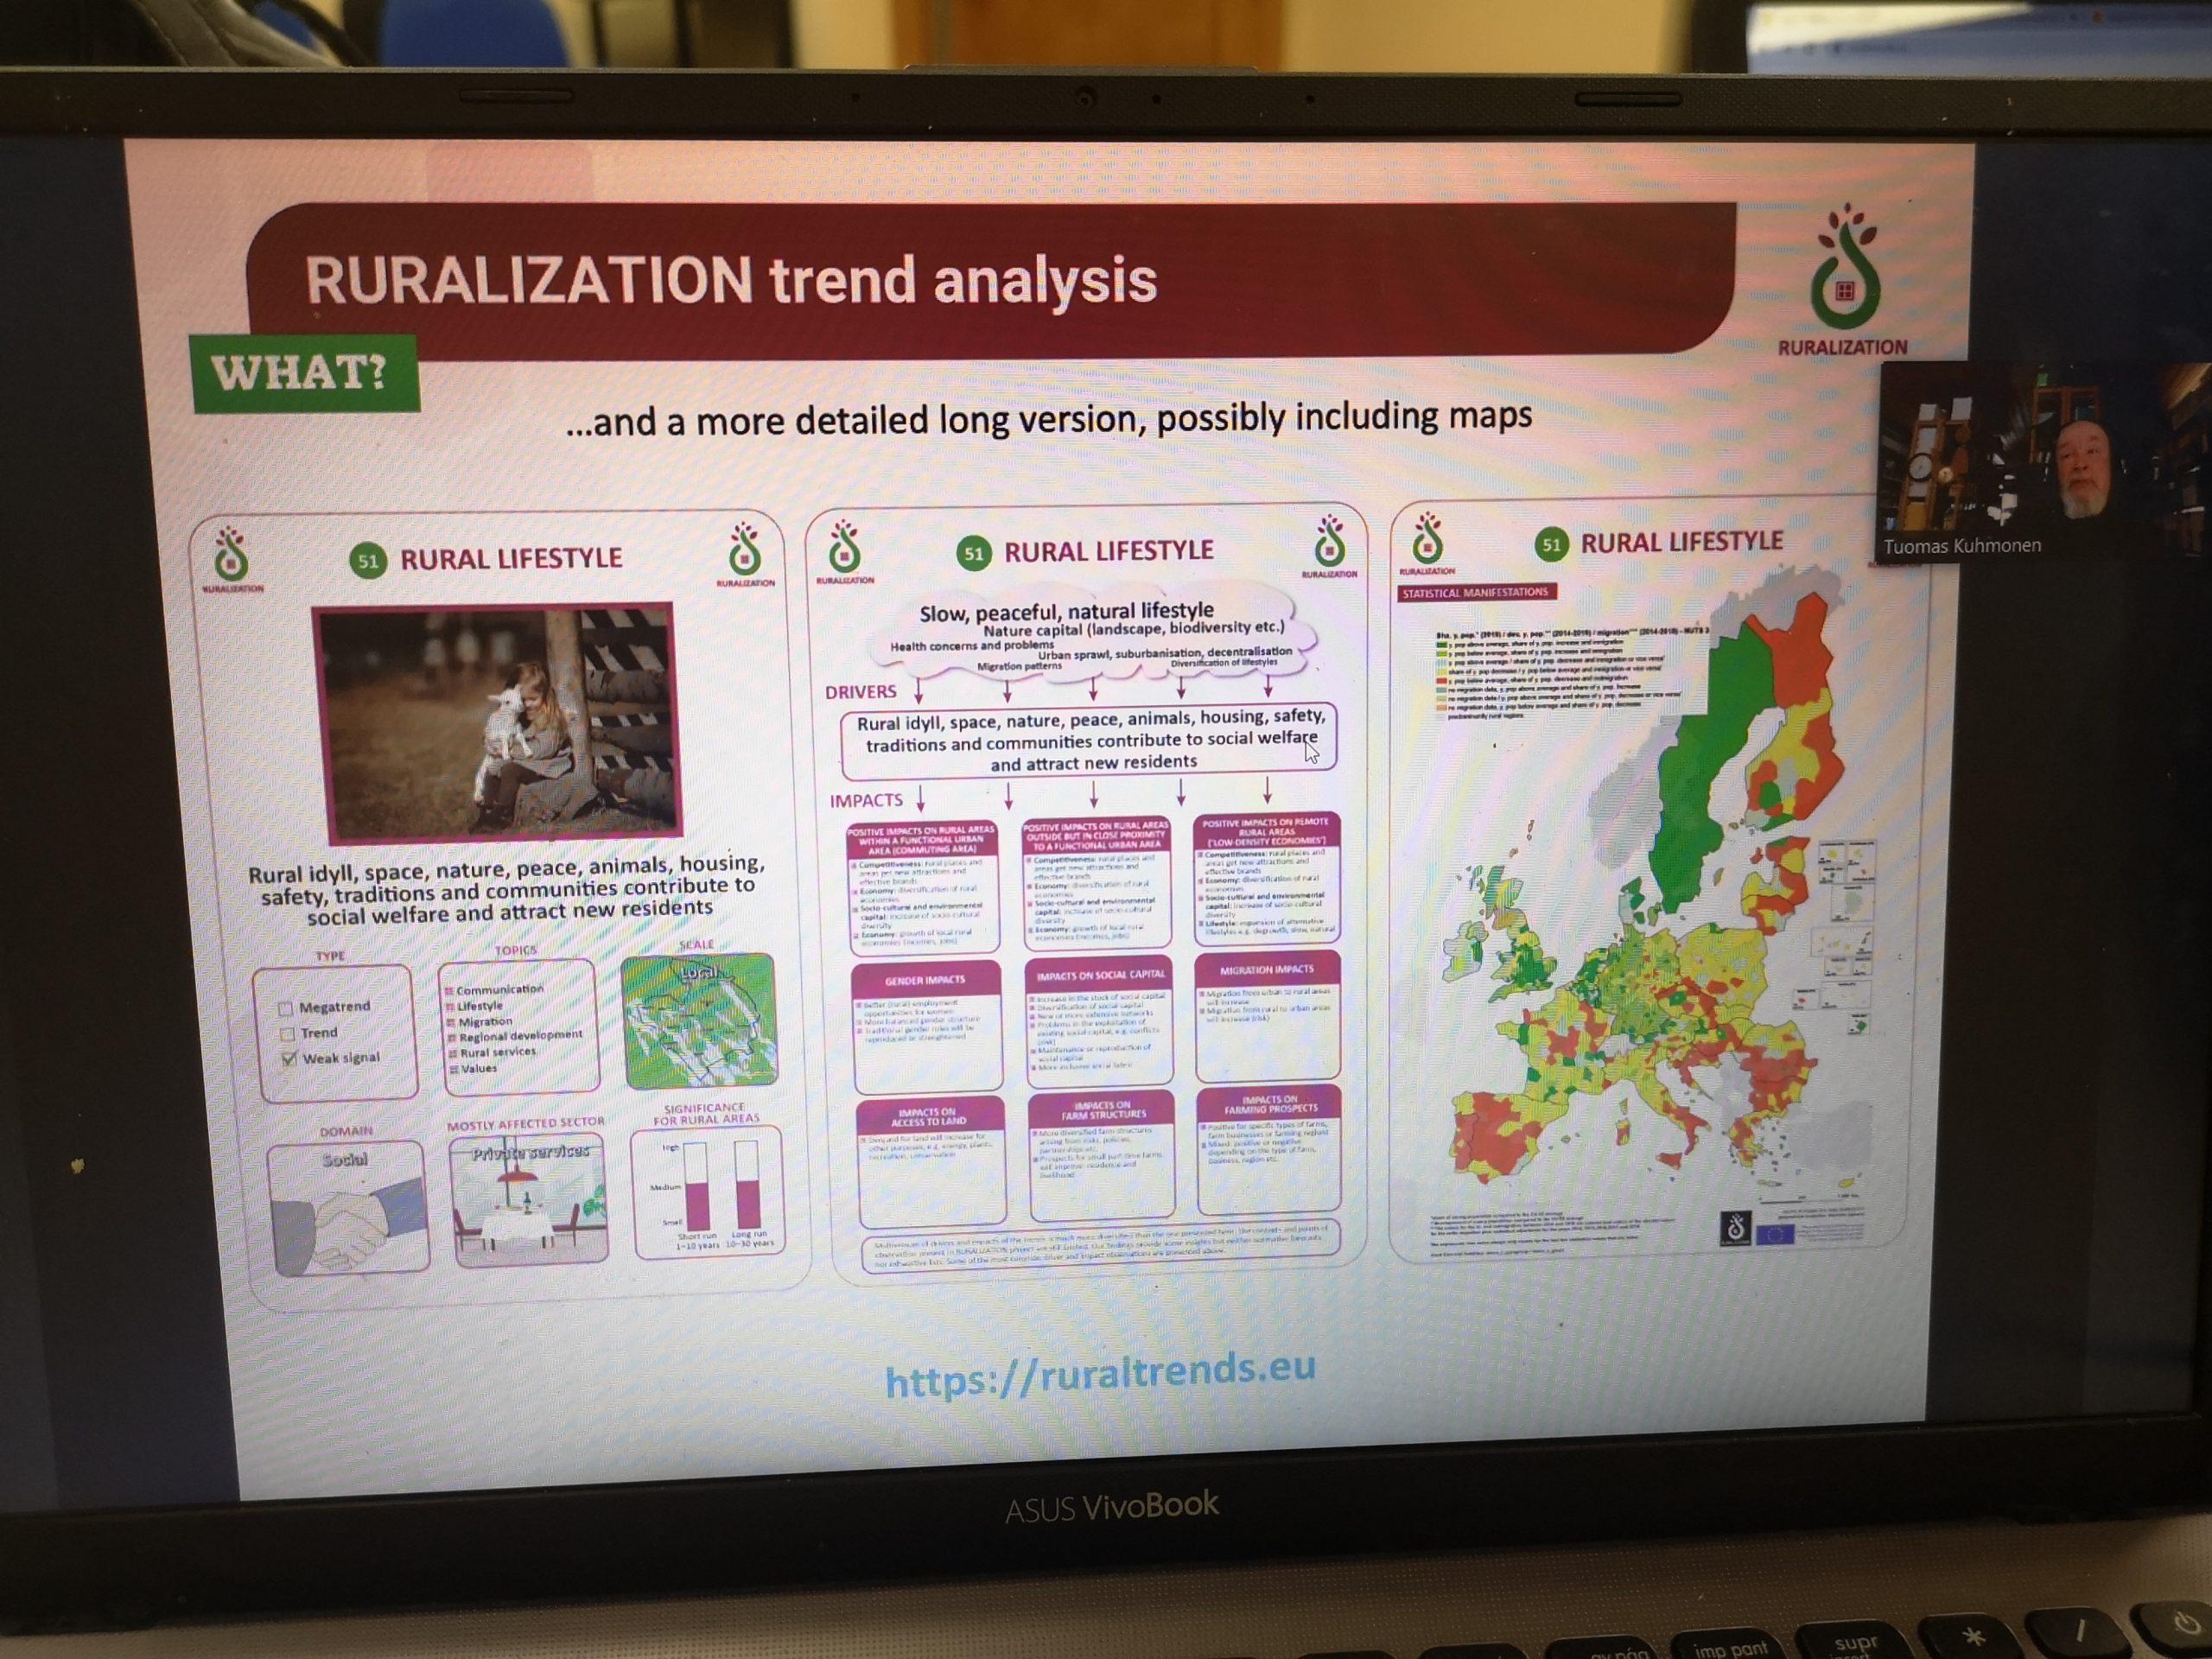 Image RURALIZATION trend analysis